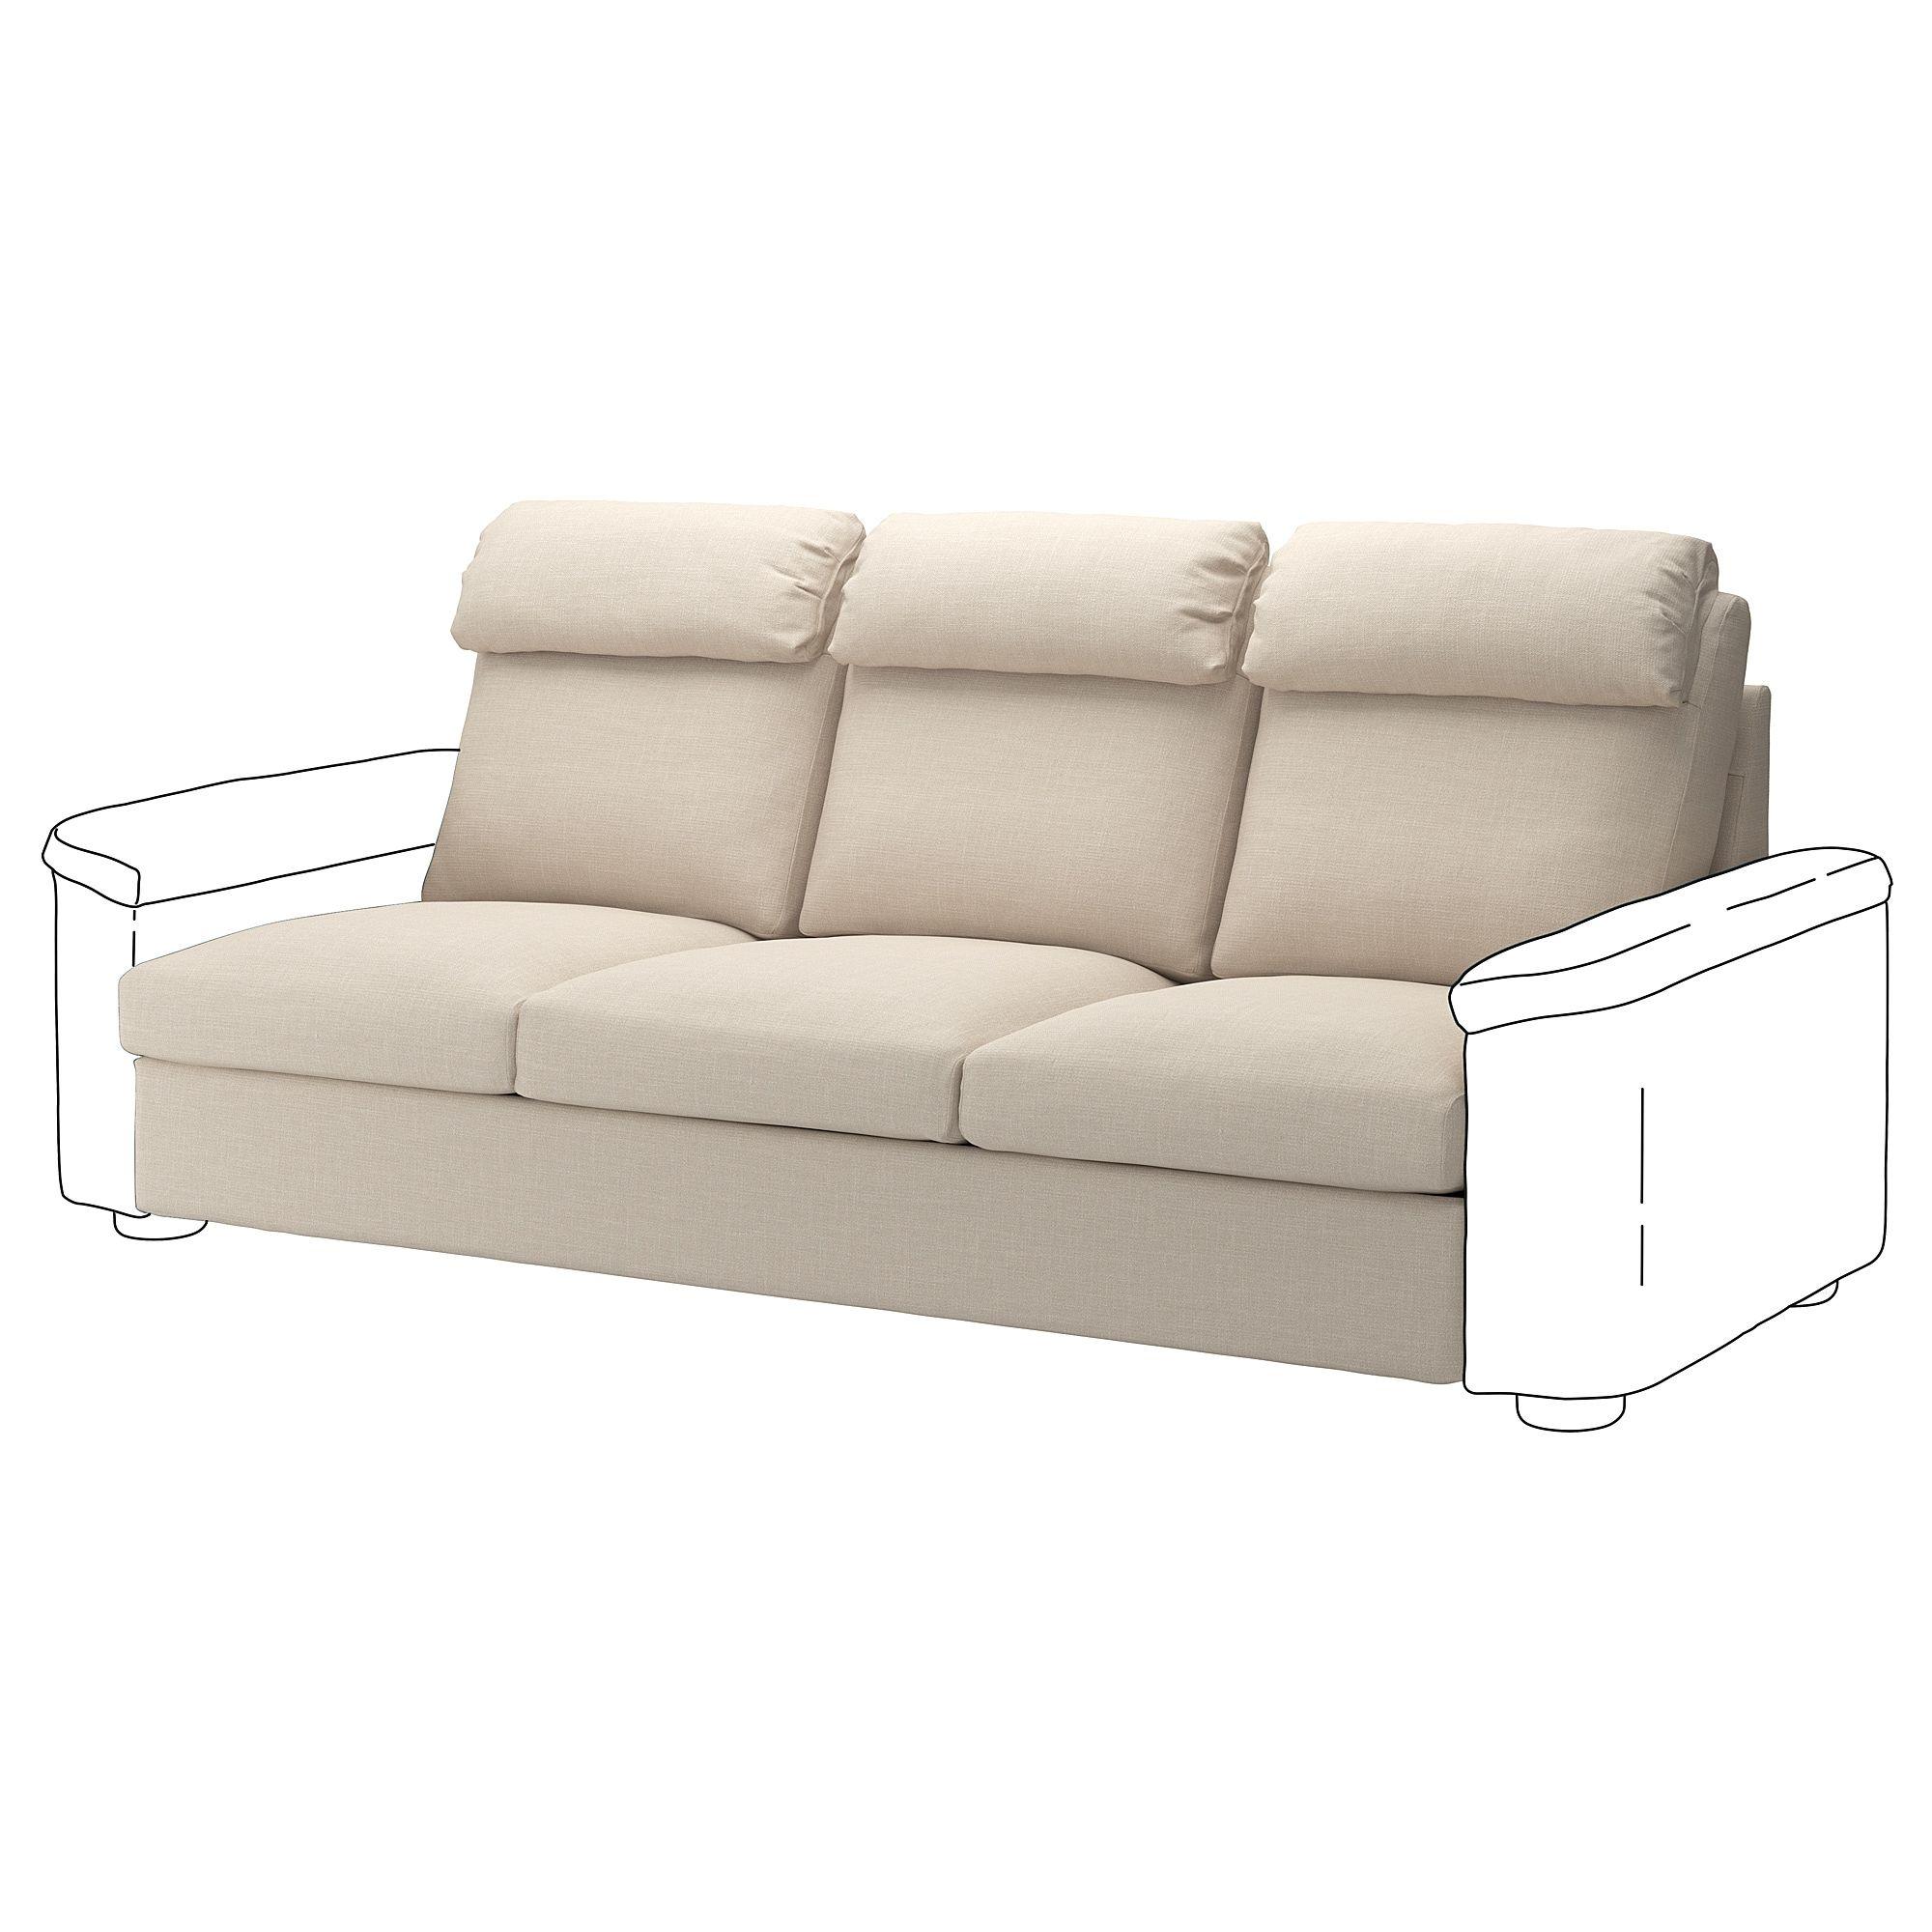 Us Furniture And Home Furnishings Ikea Modular Sofa Light Beige